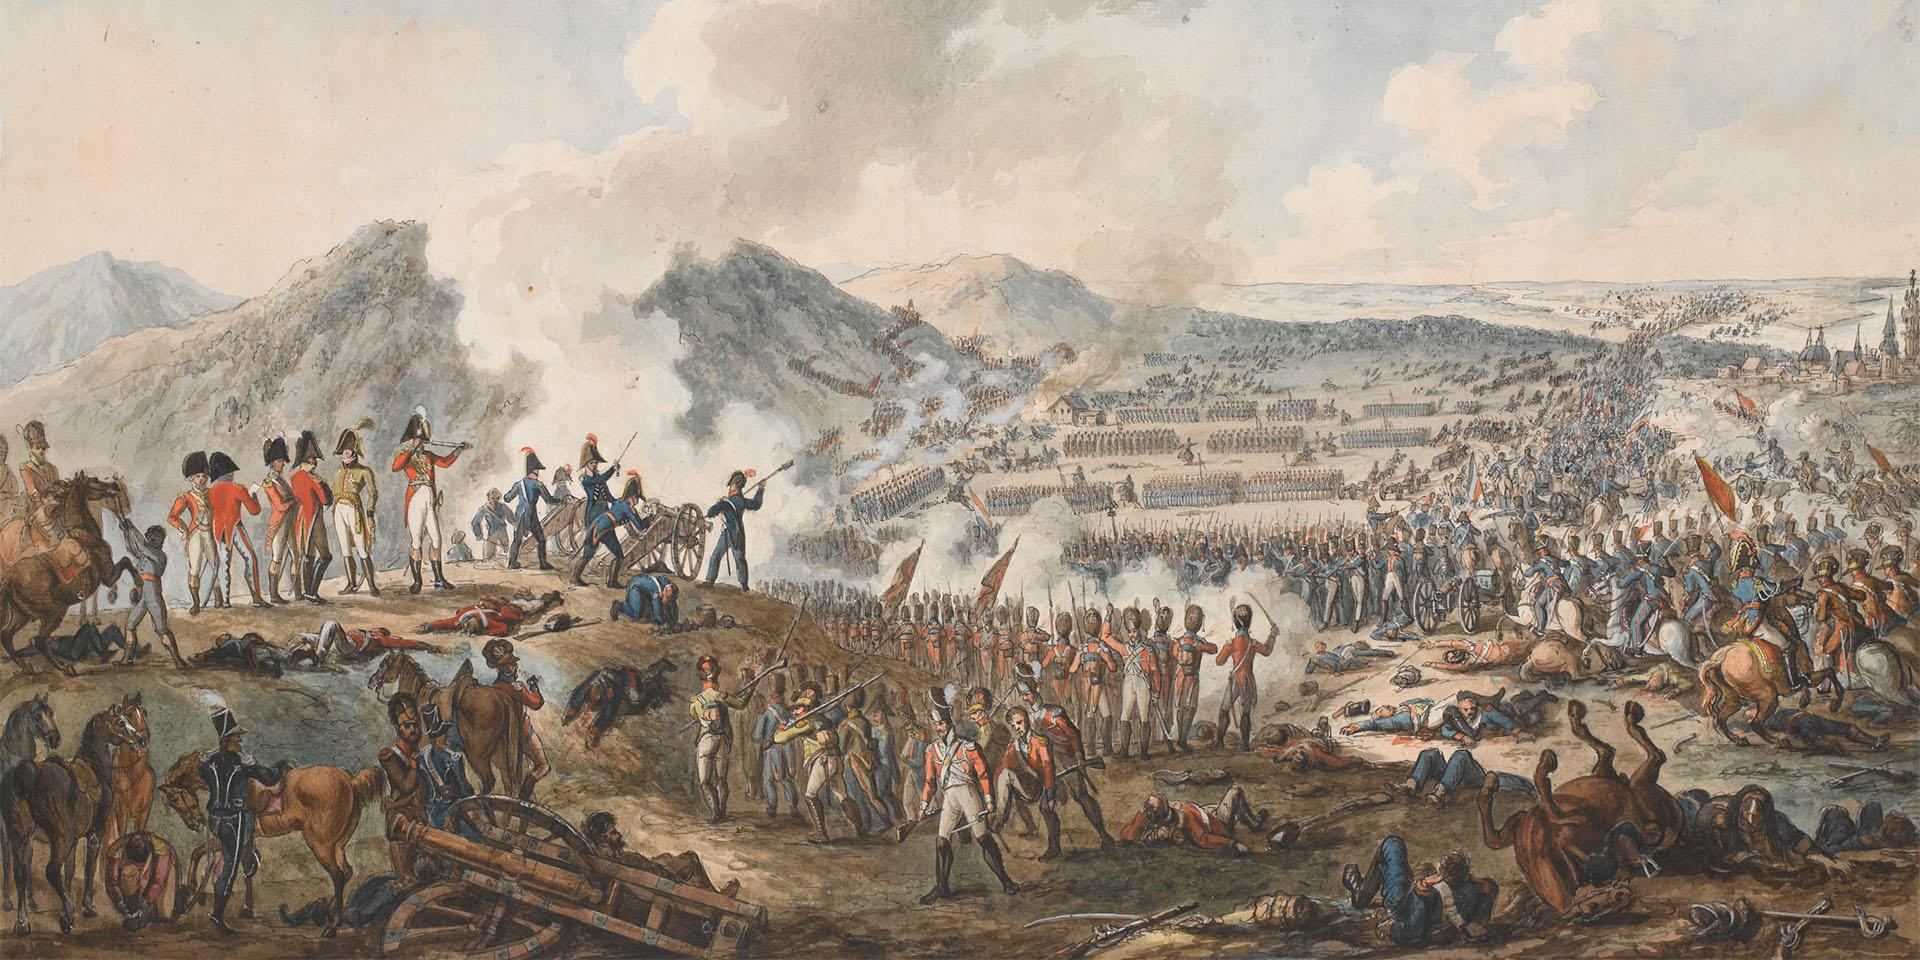 The Battle of Talavera, 28 July 1809